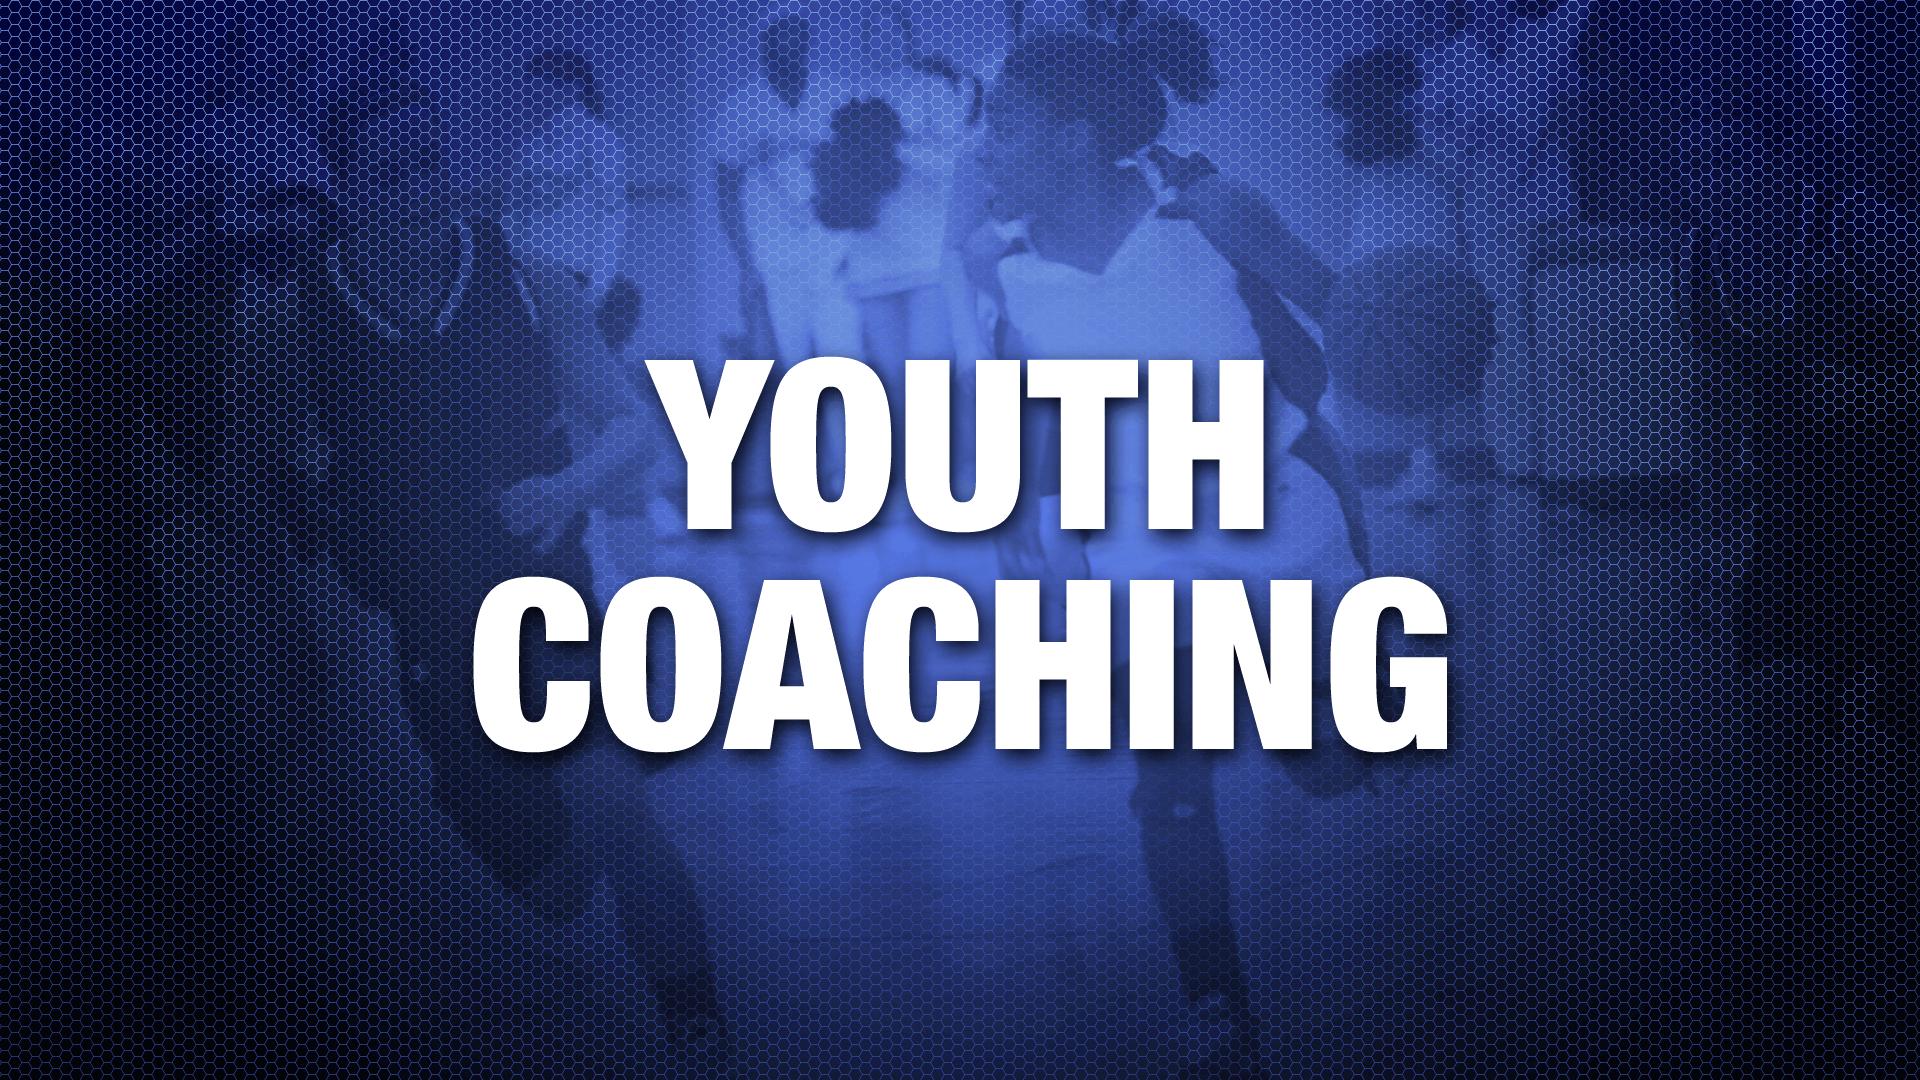 YouthCoaching